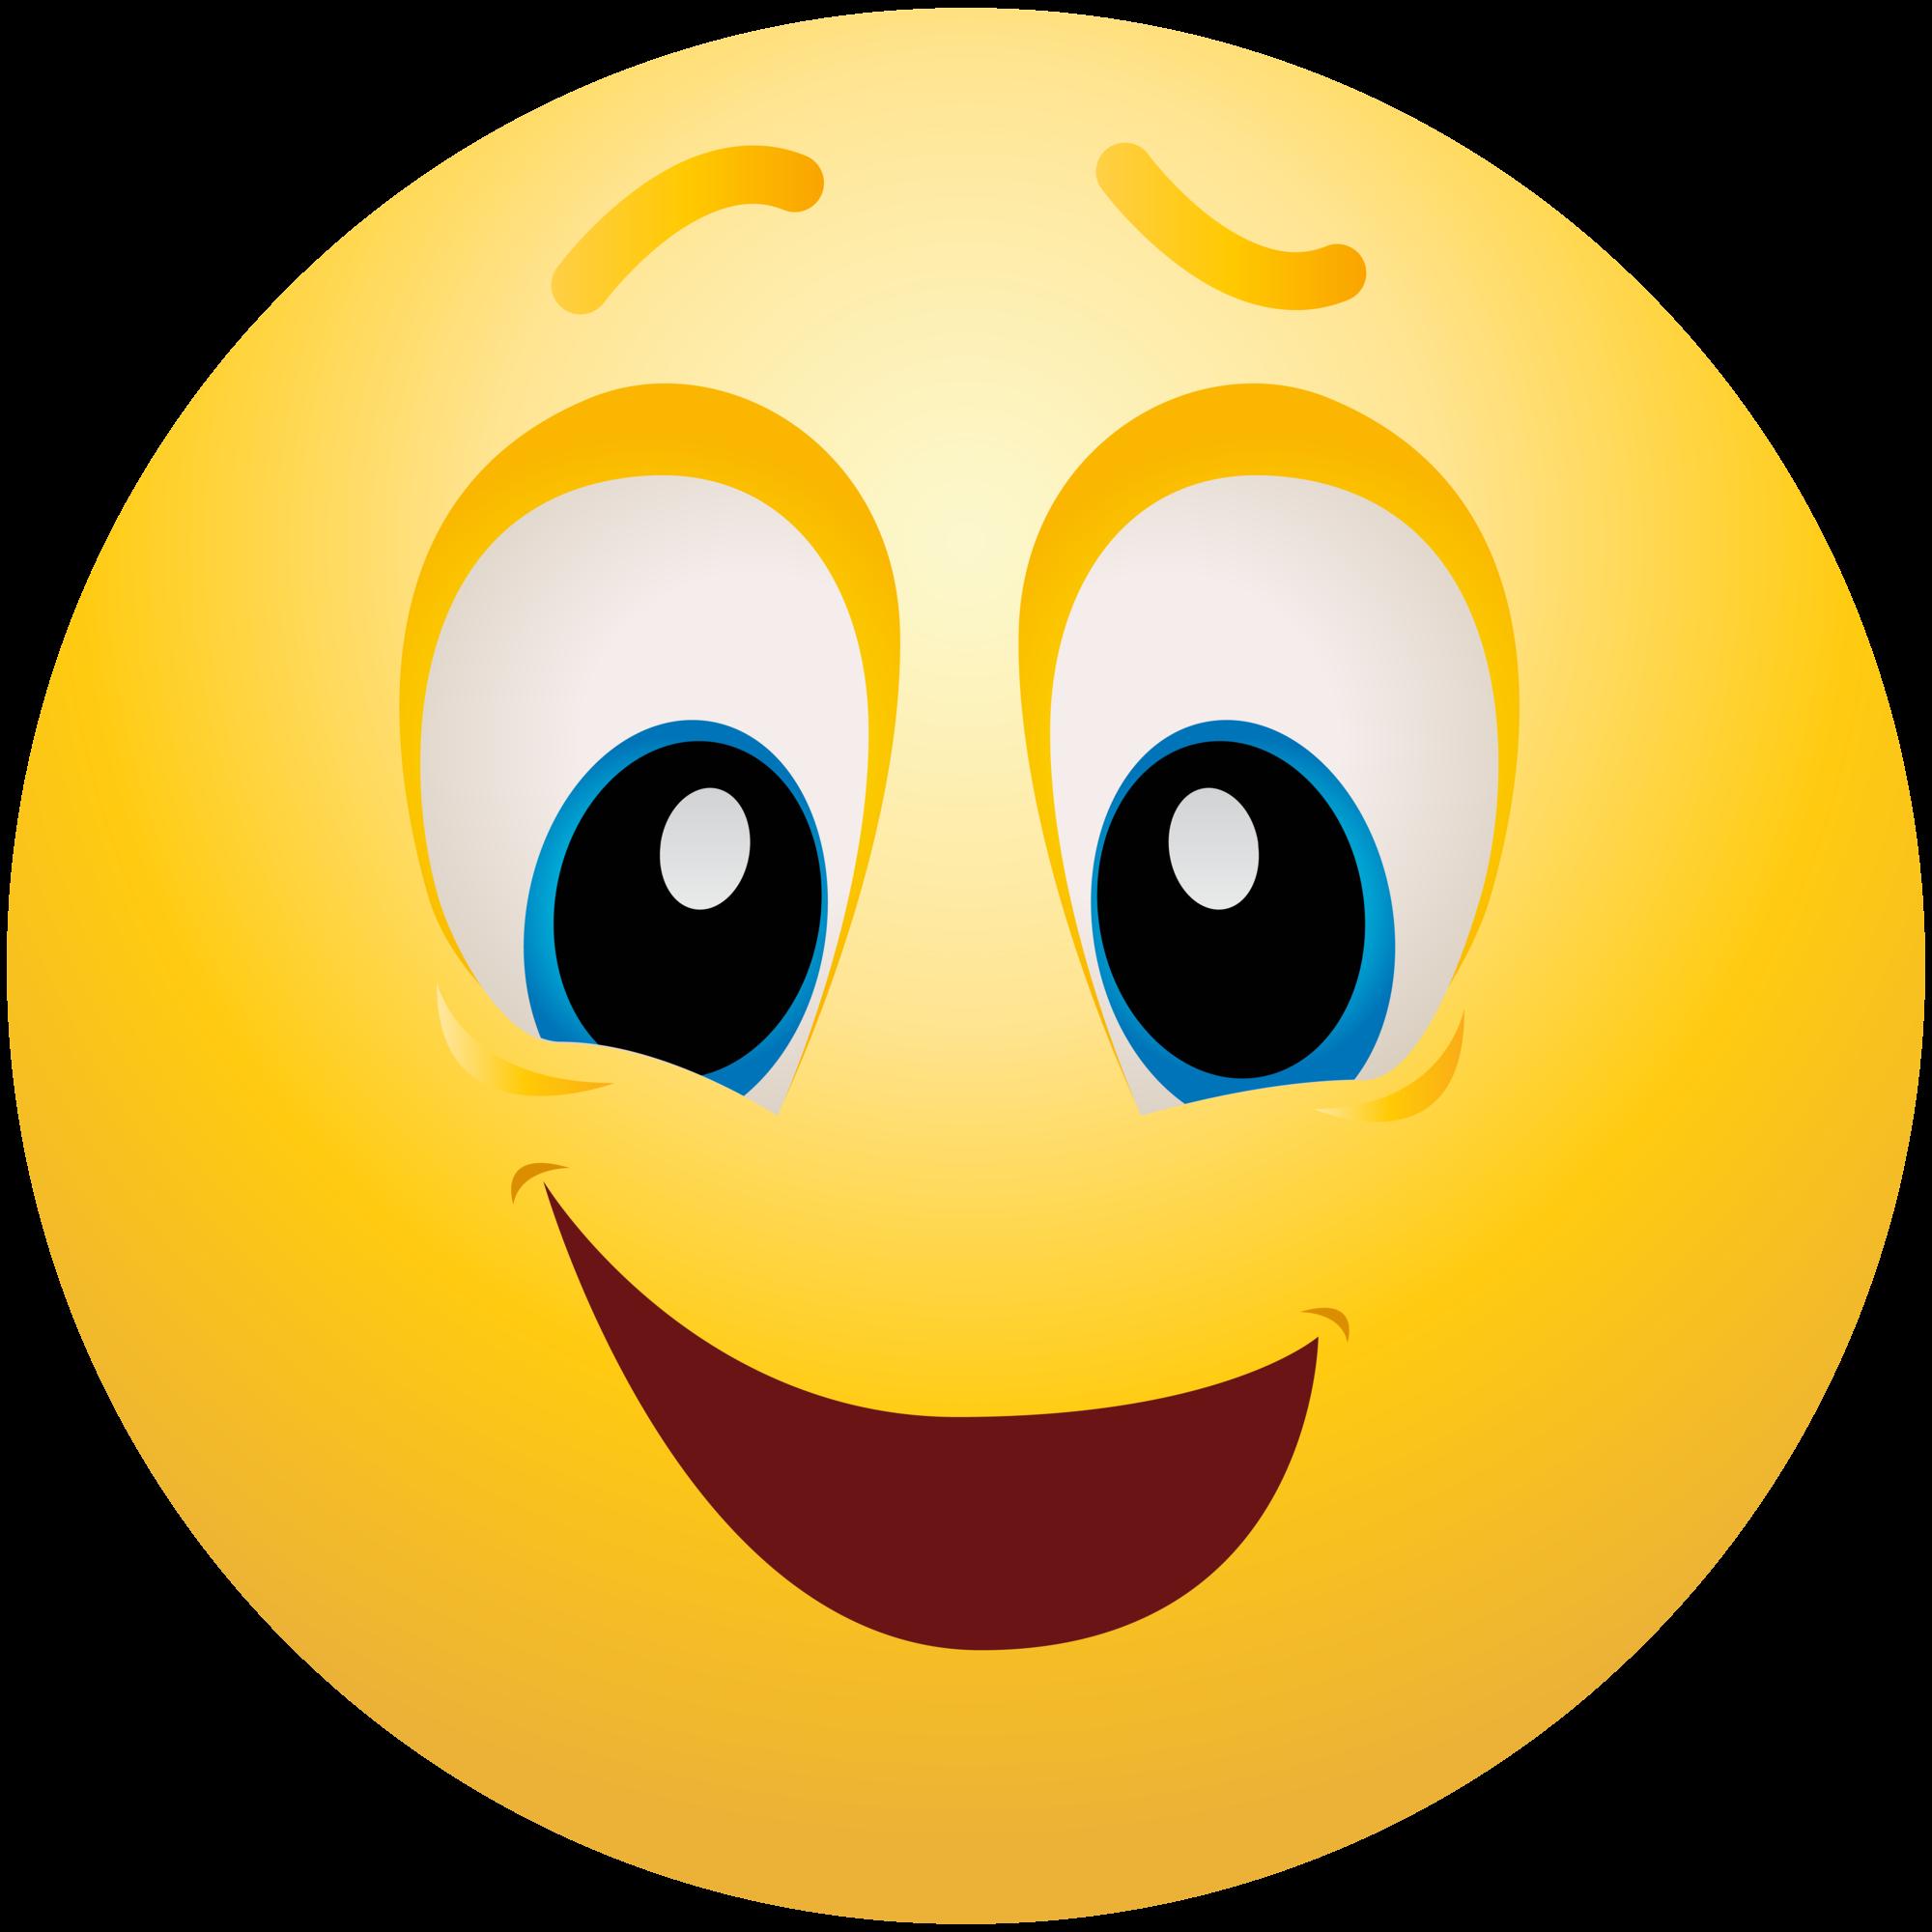 emoji happy feeling emoticon clipart downloads info